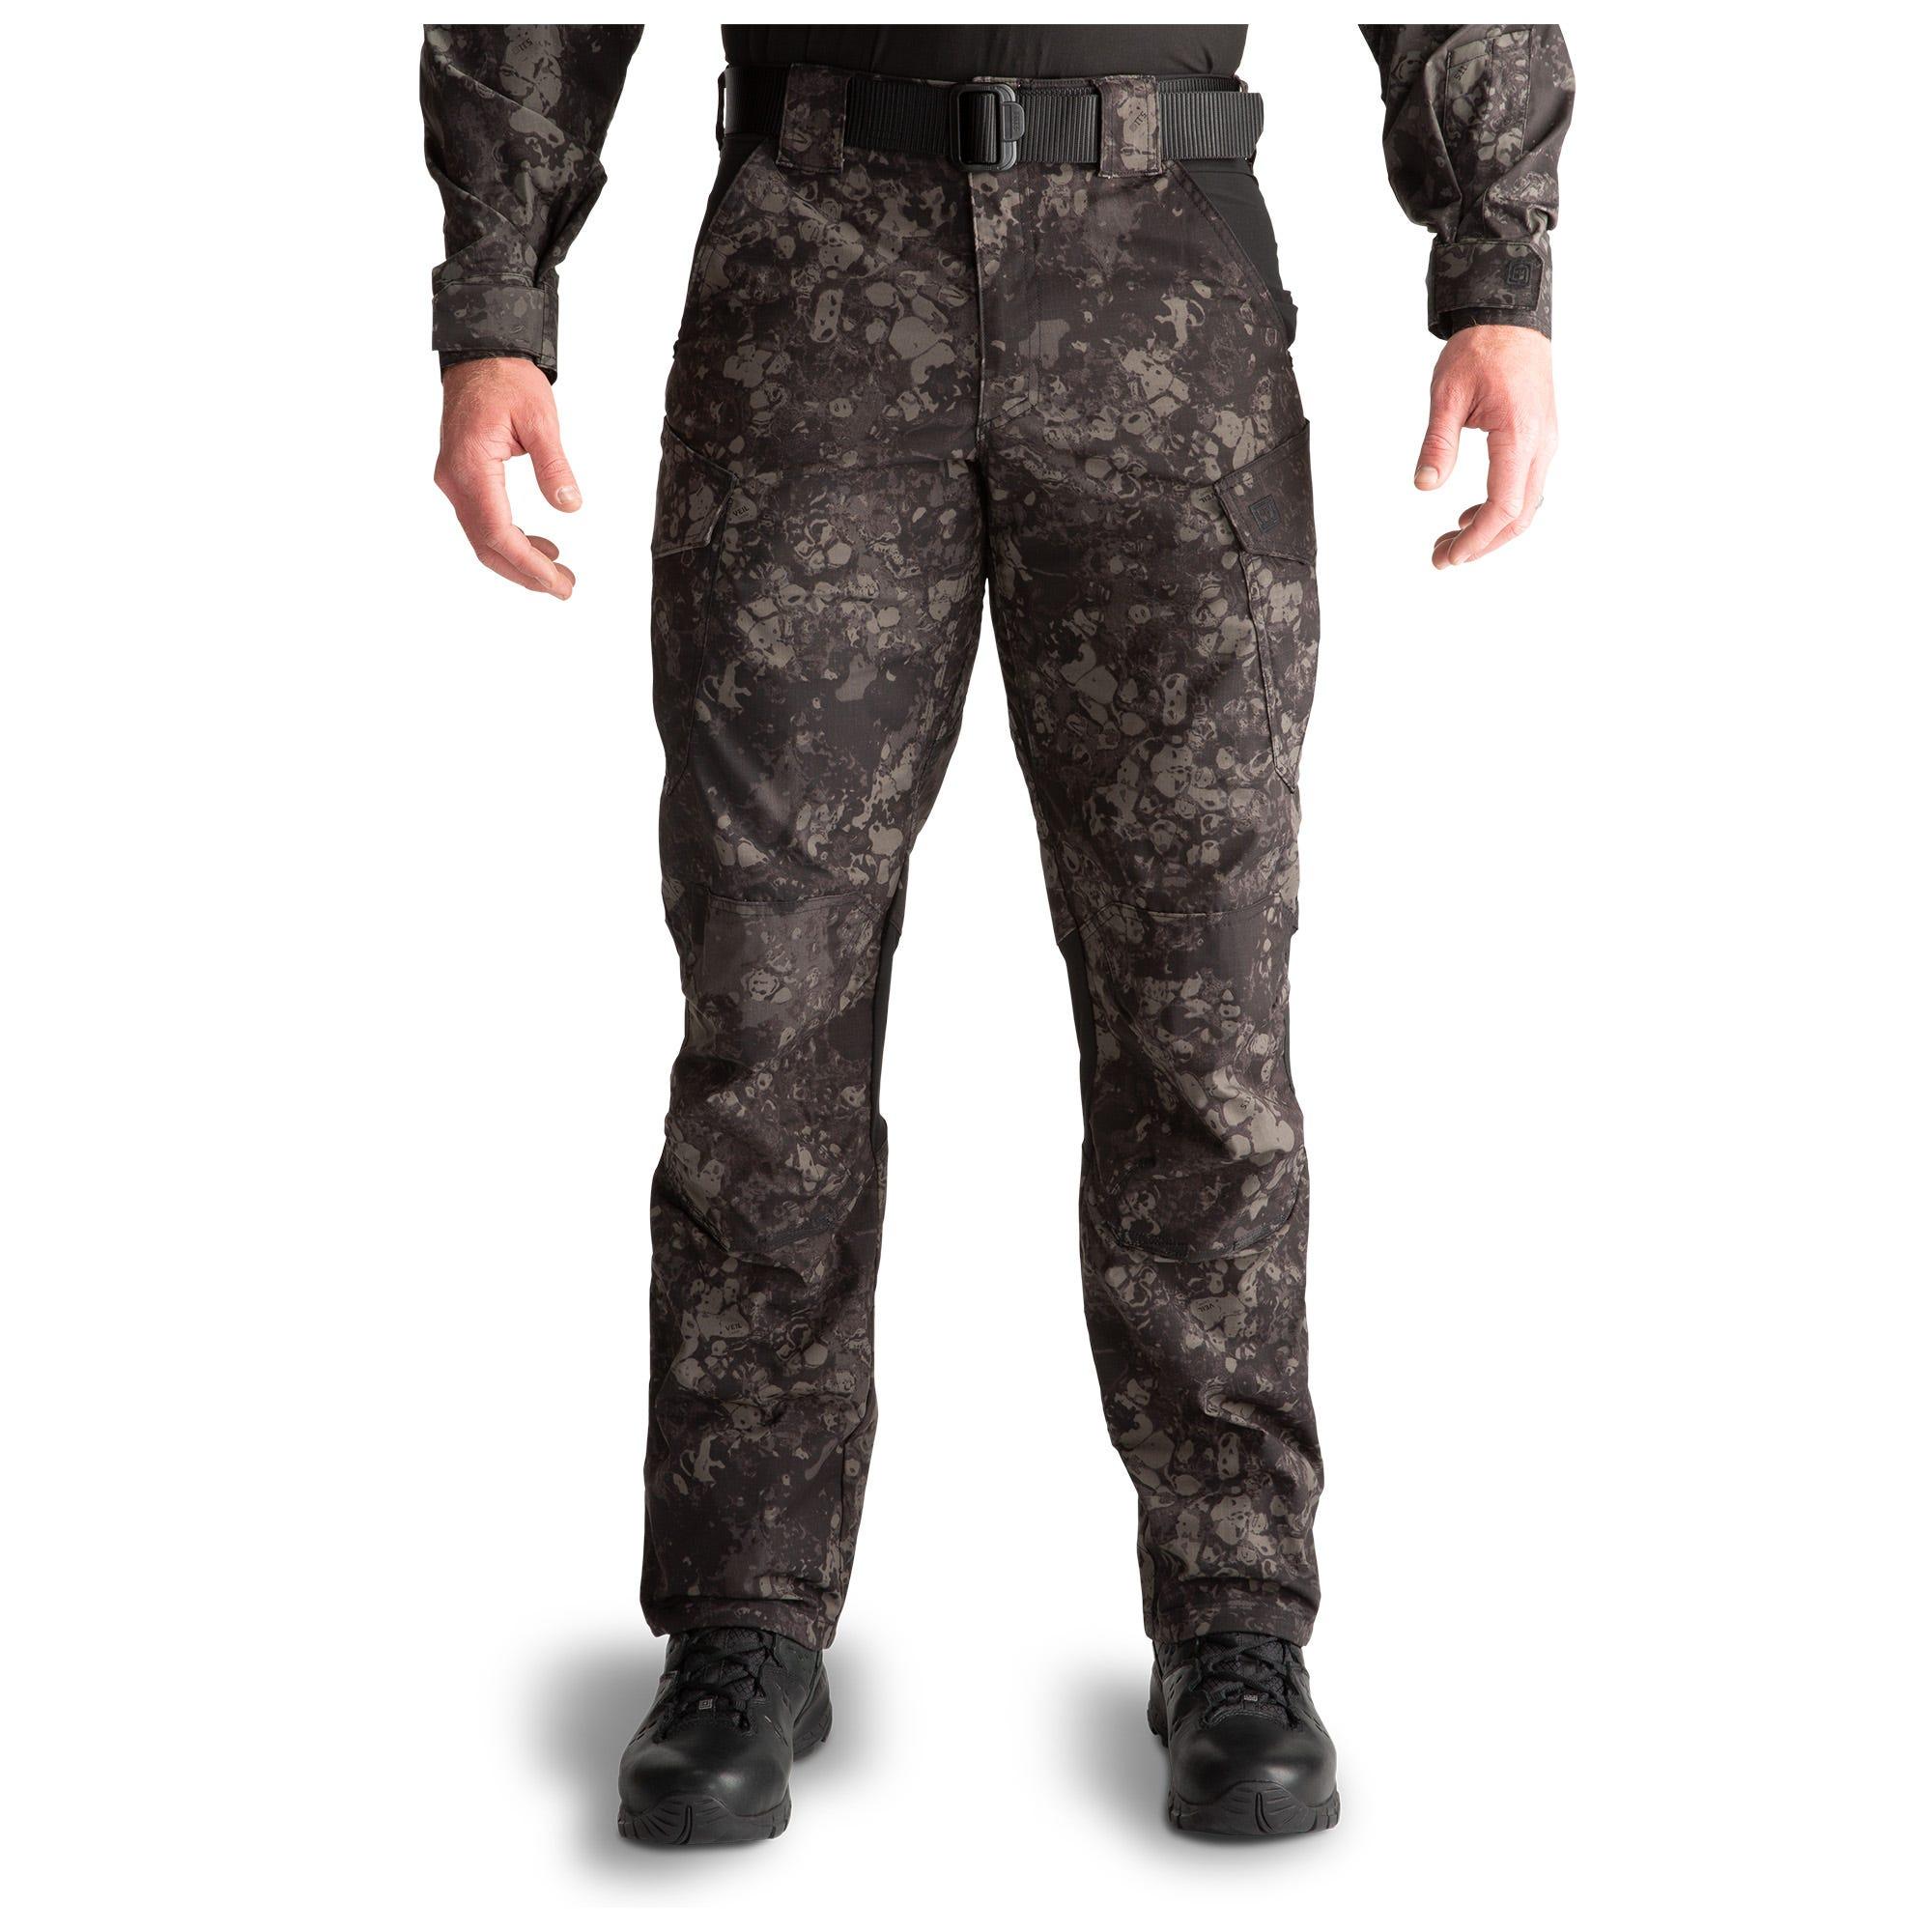 5.11 Tactical Men's GEO7 Stryke TDU Pant, Size 44/32 (Cargo Pant) thumbnail